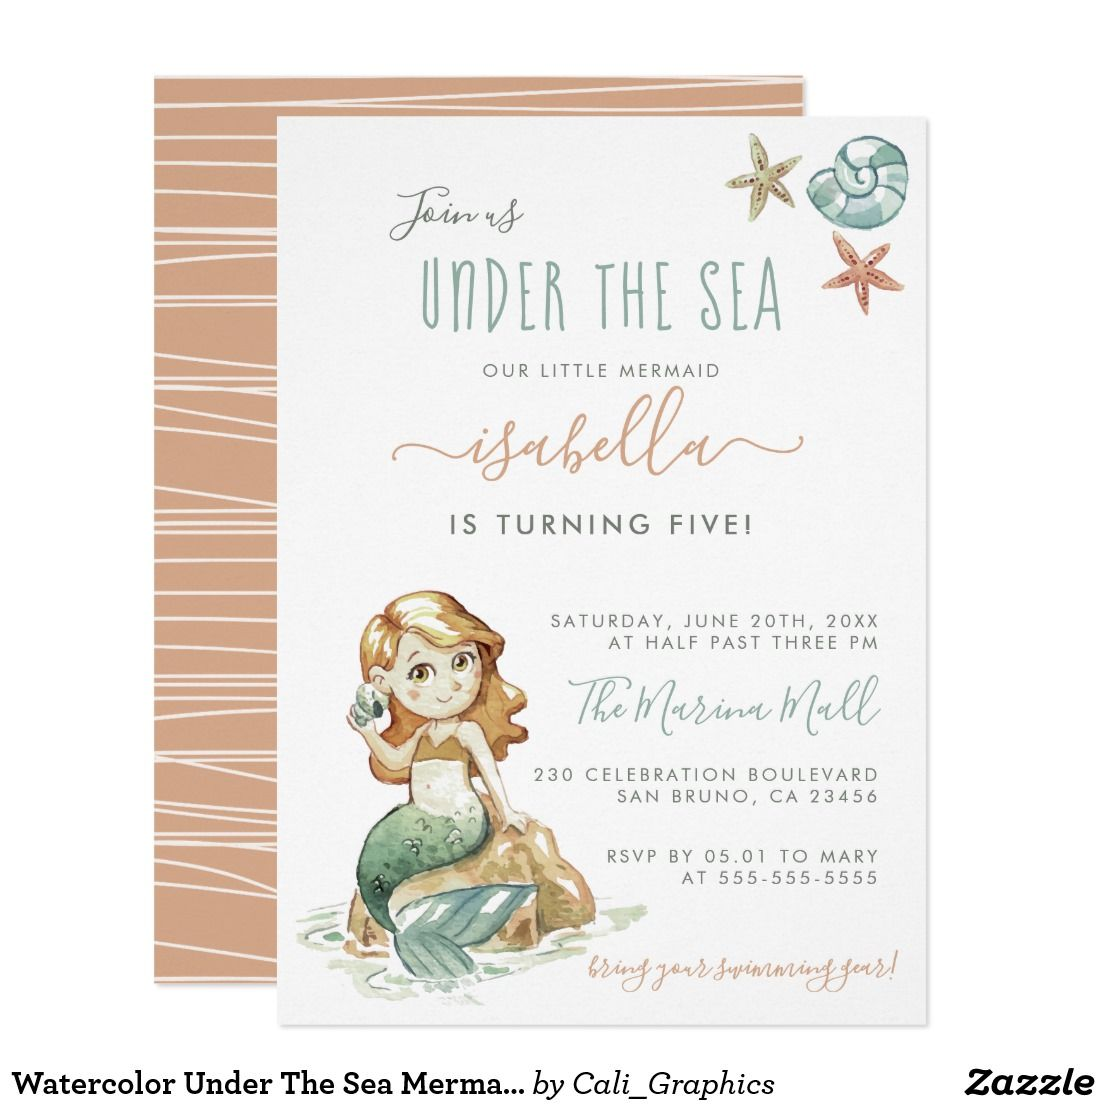 Watercolor under the sea mermaid birthday party invitation mermaid